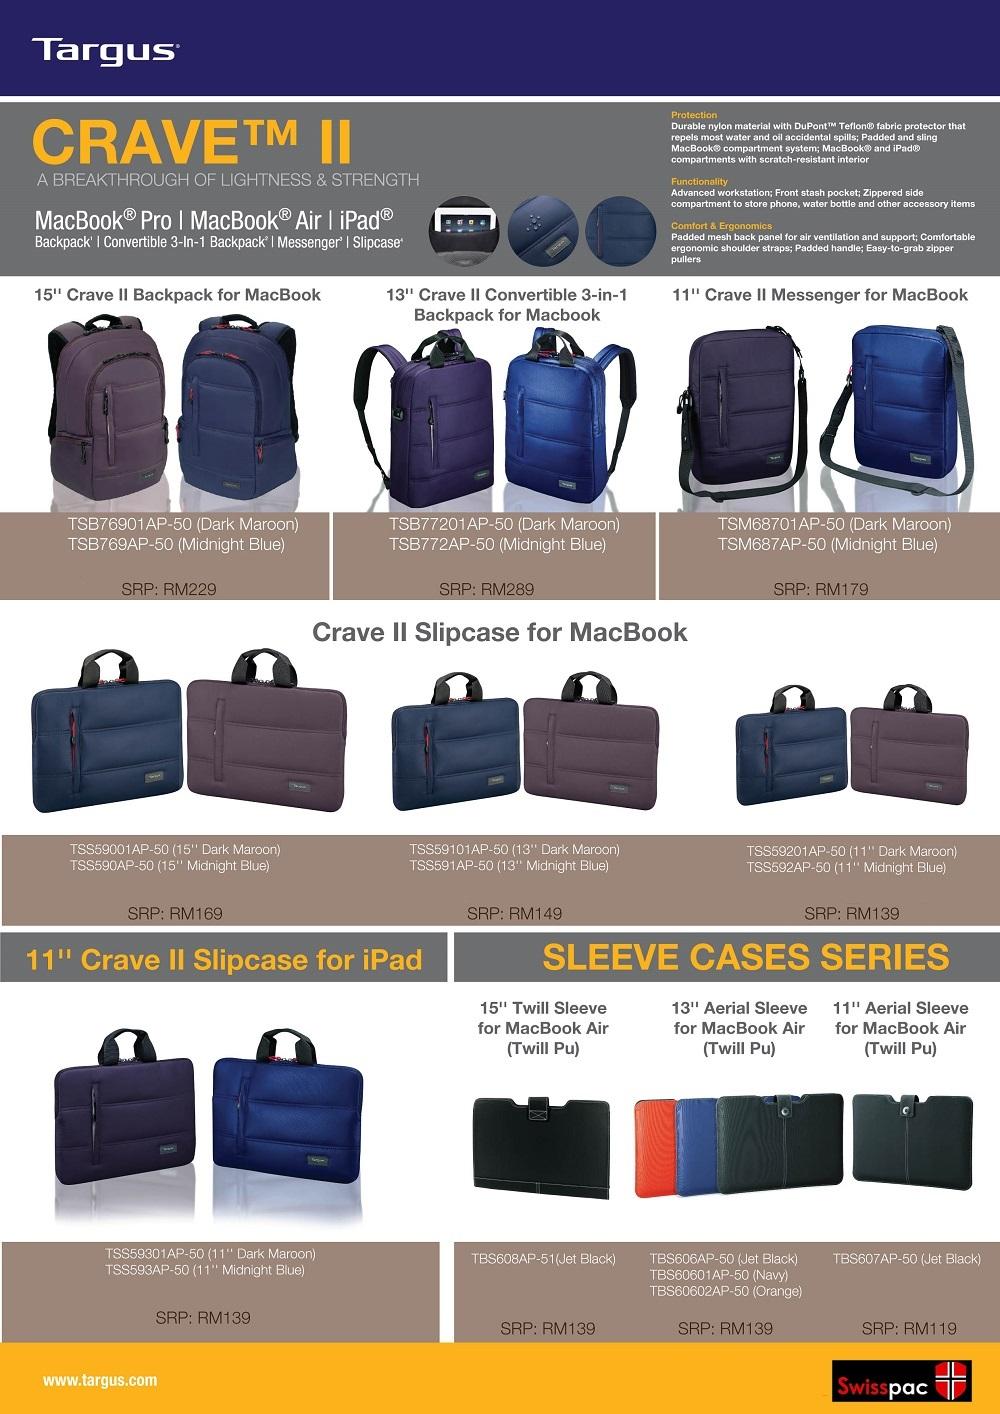 new targus bag series price listnAPR